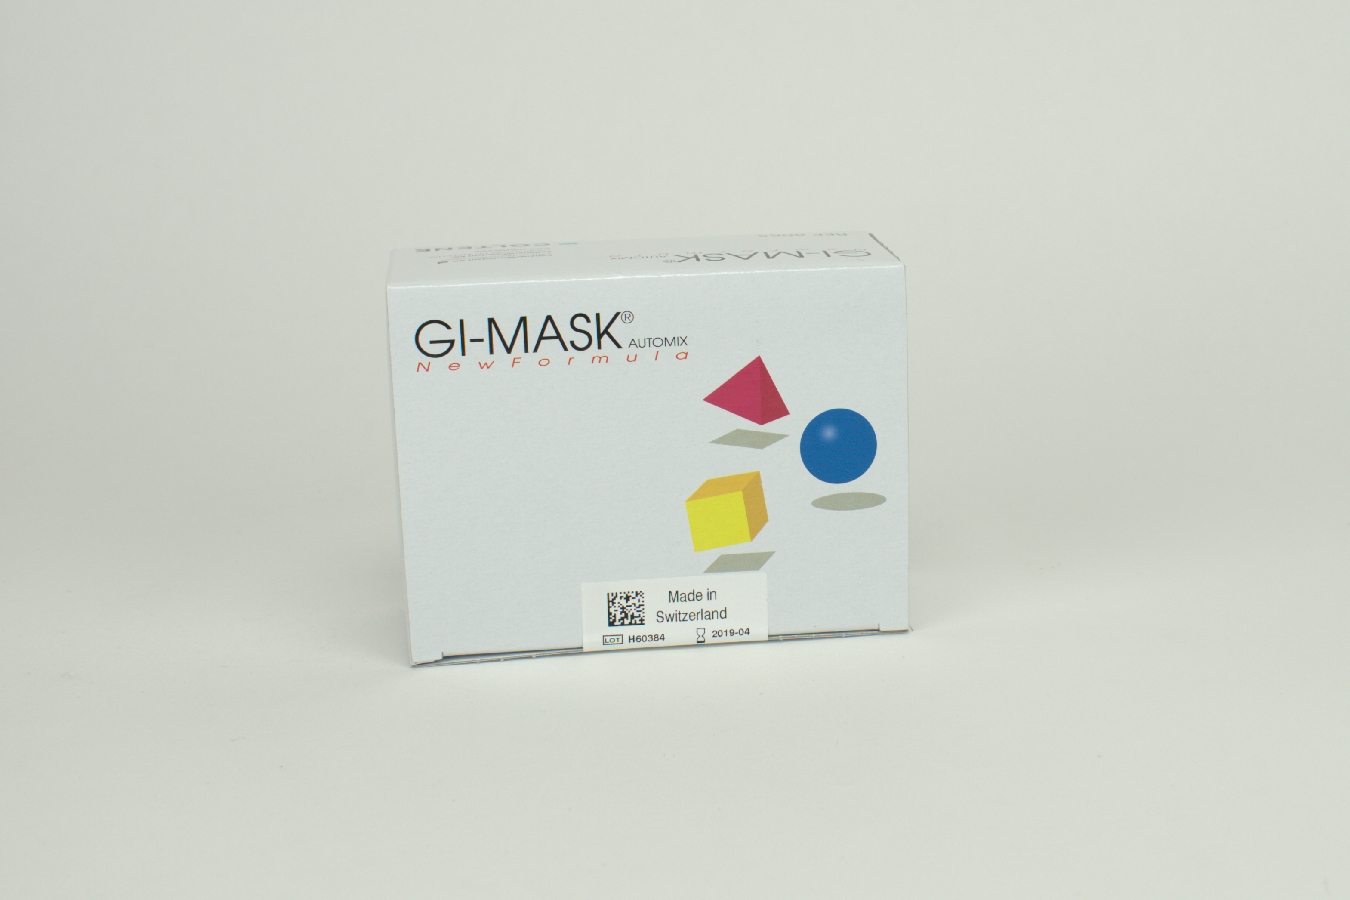 Gi-Mask Automix Nf 8065 Nachfüllpackung 2x50ml